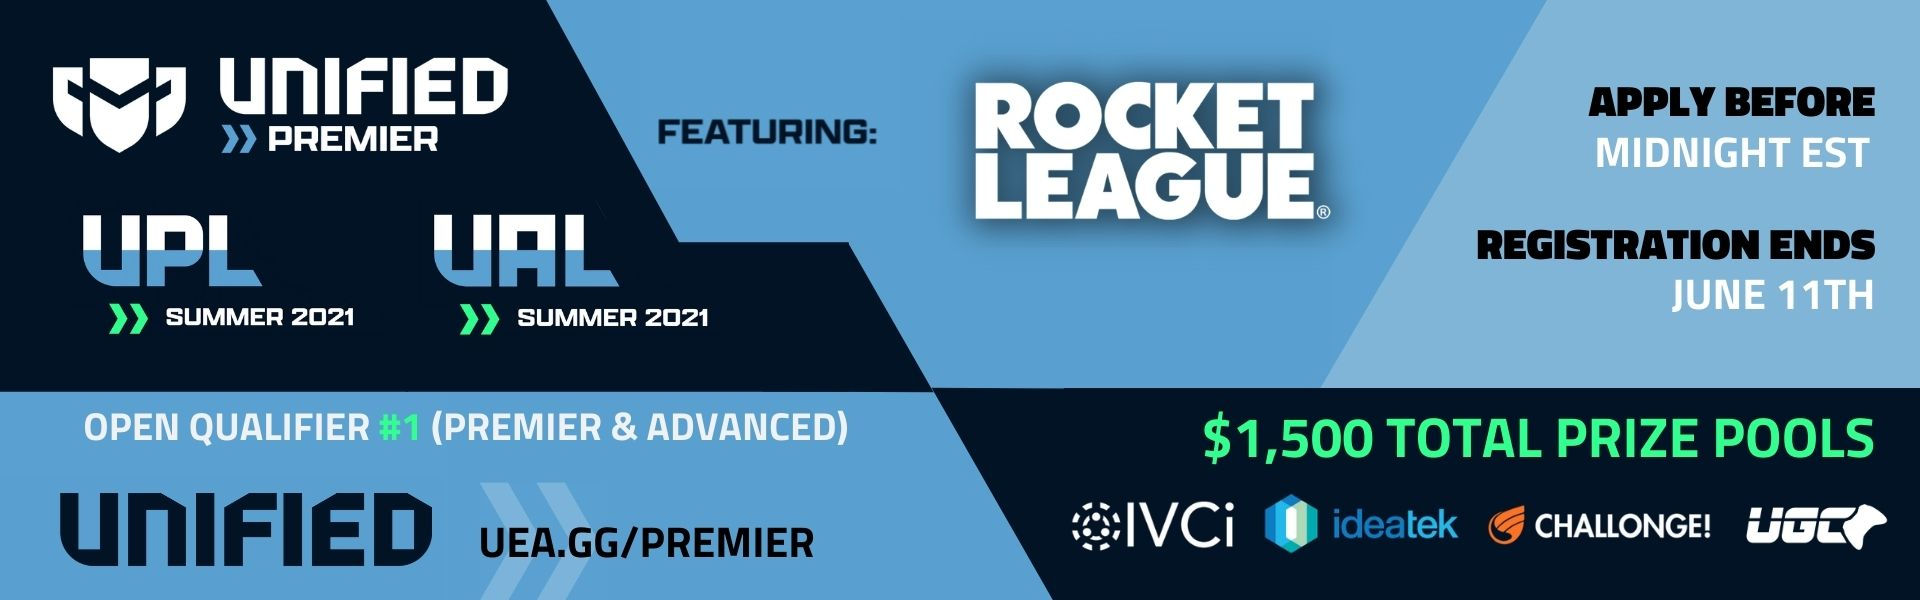 Unified Rocket League Open Qualifier #1